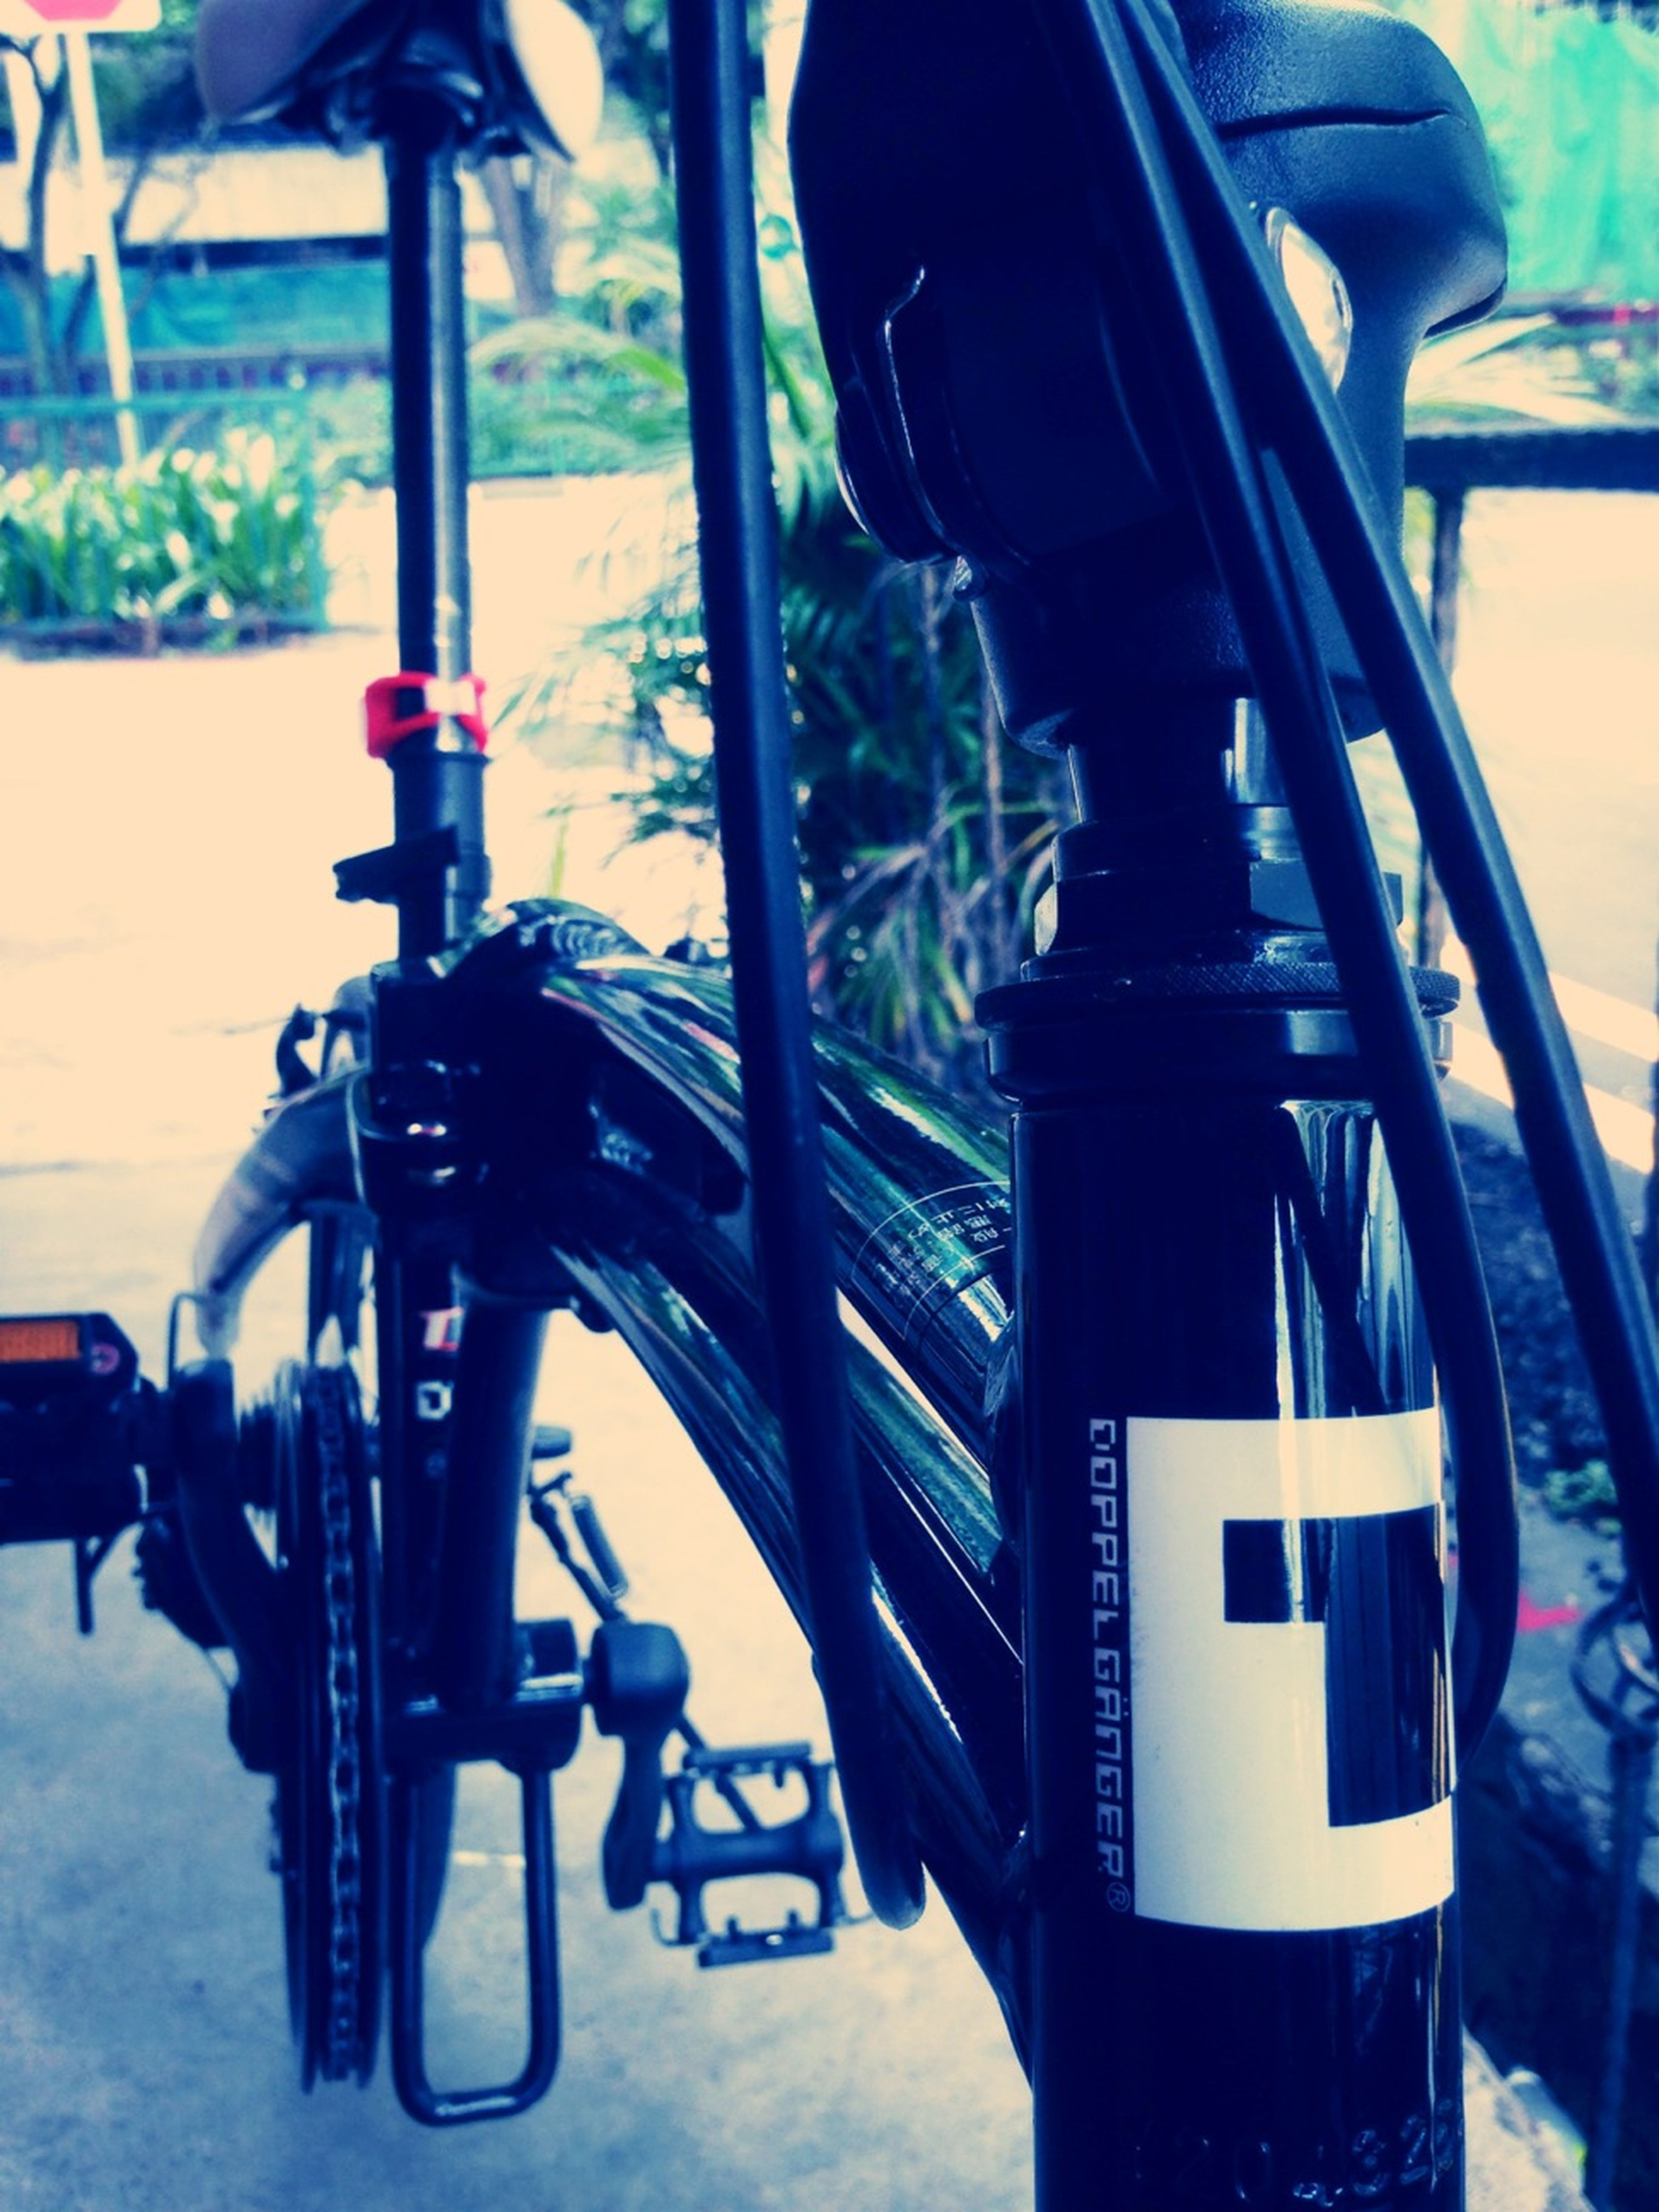 Morning Ride On My Foldy Bike